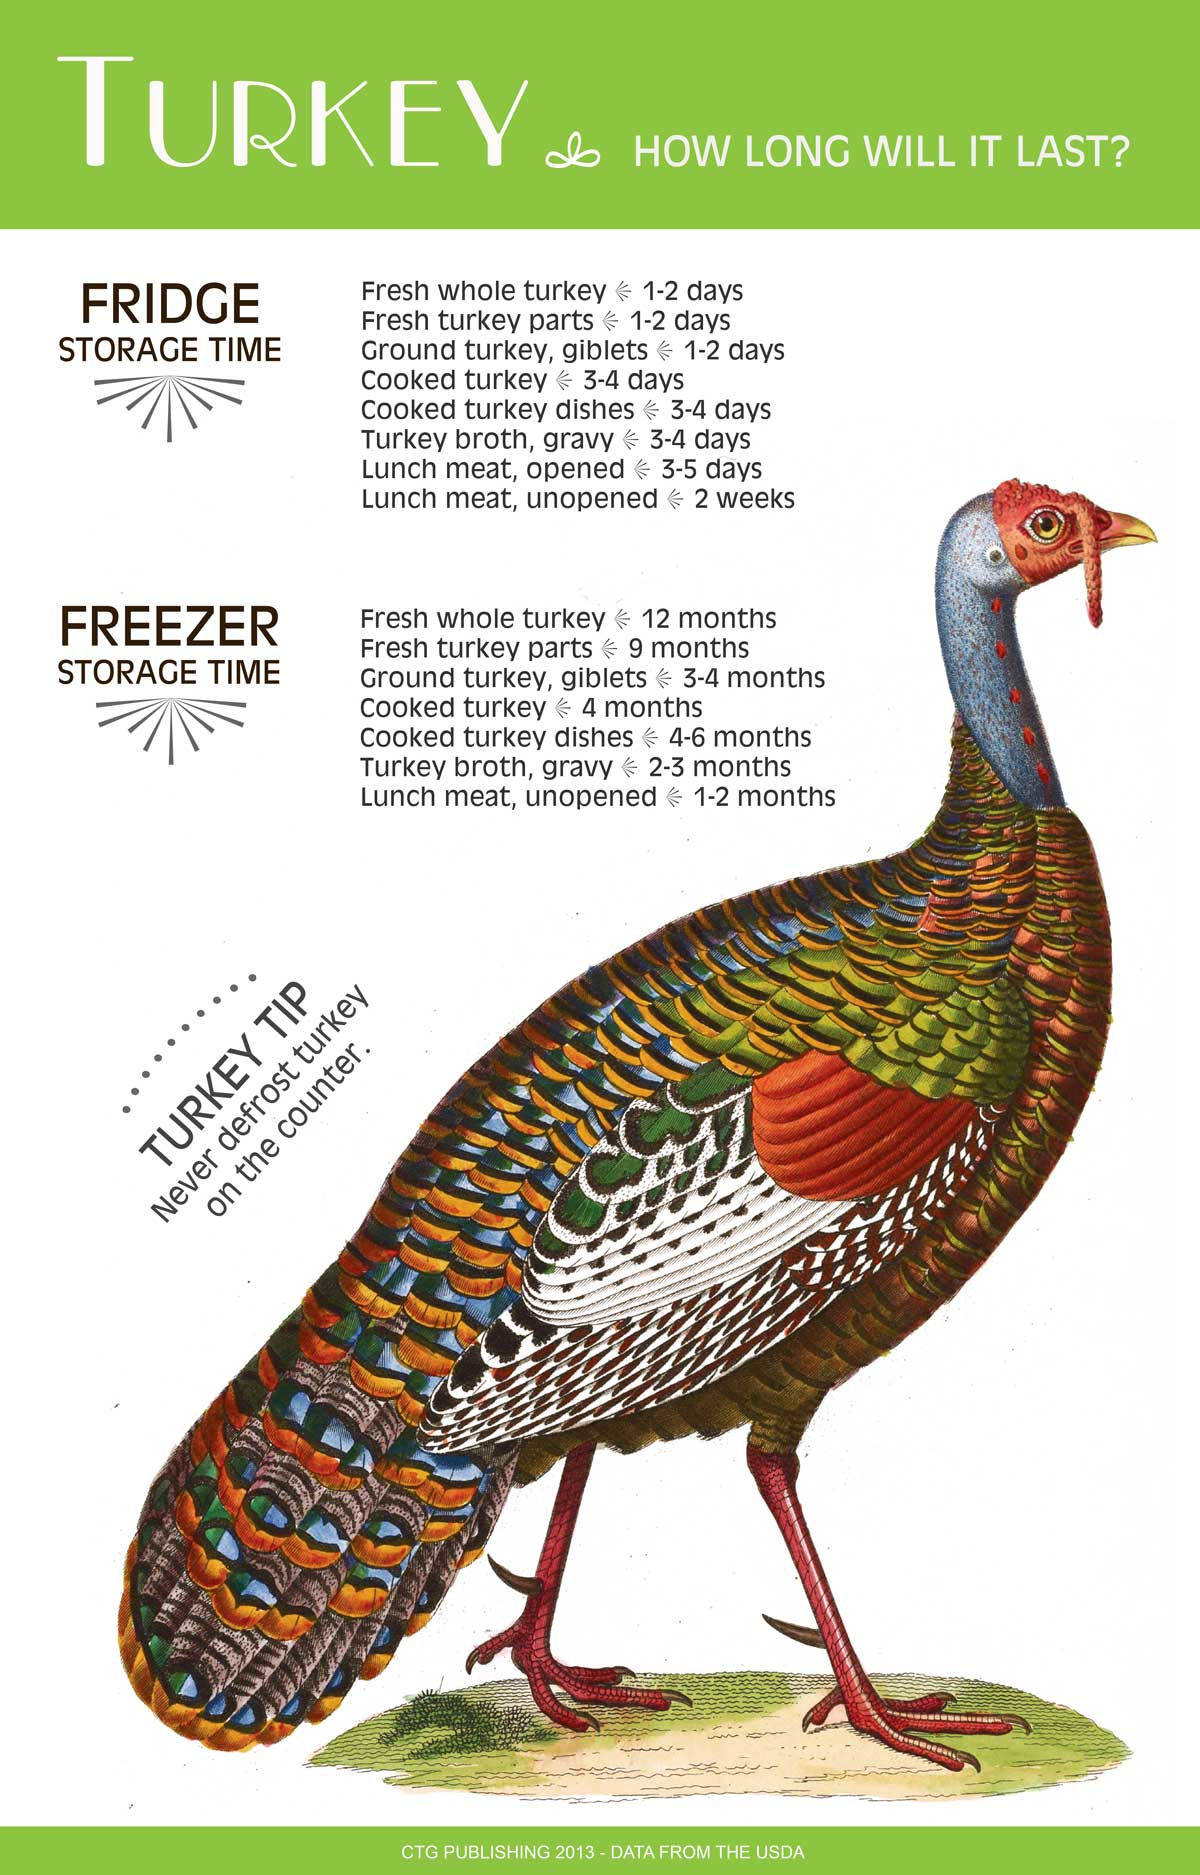 Fresh and Frozen Turkey - How long will it last?